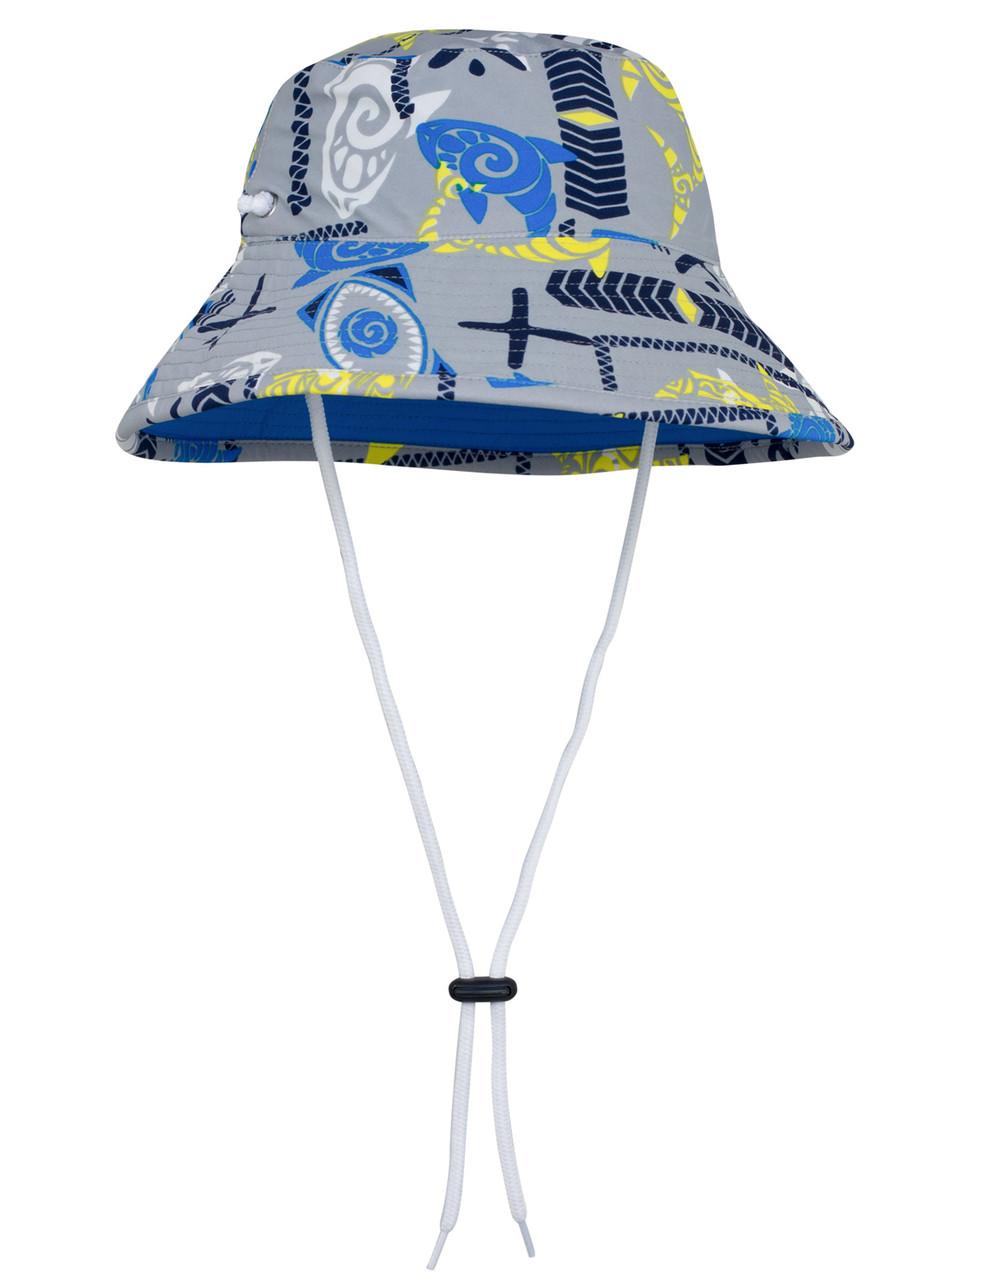 Tuga boys reversible UV bucket hat upf50 fanatic 70875f0cce3